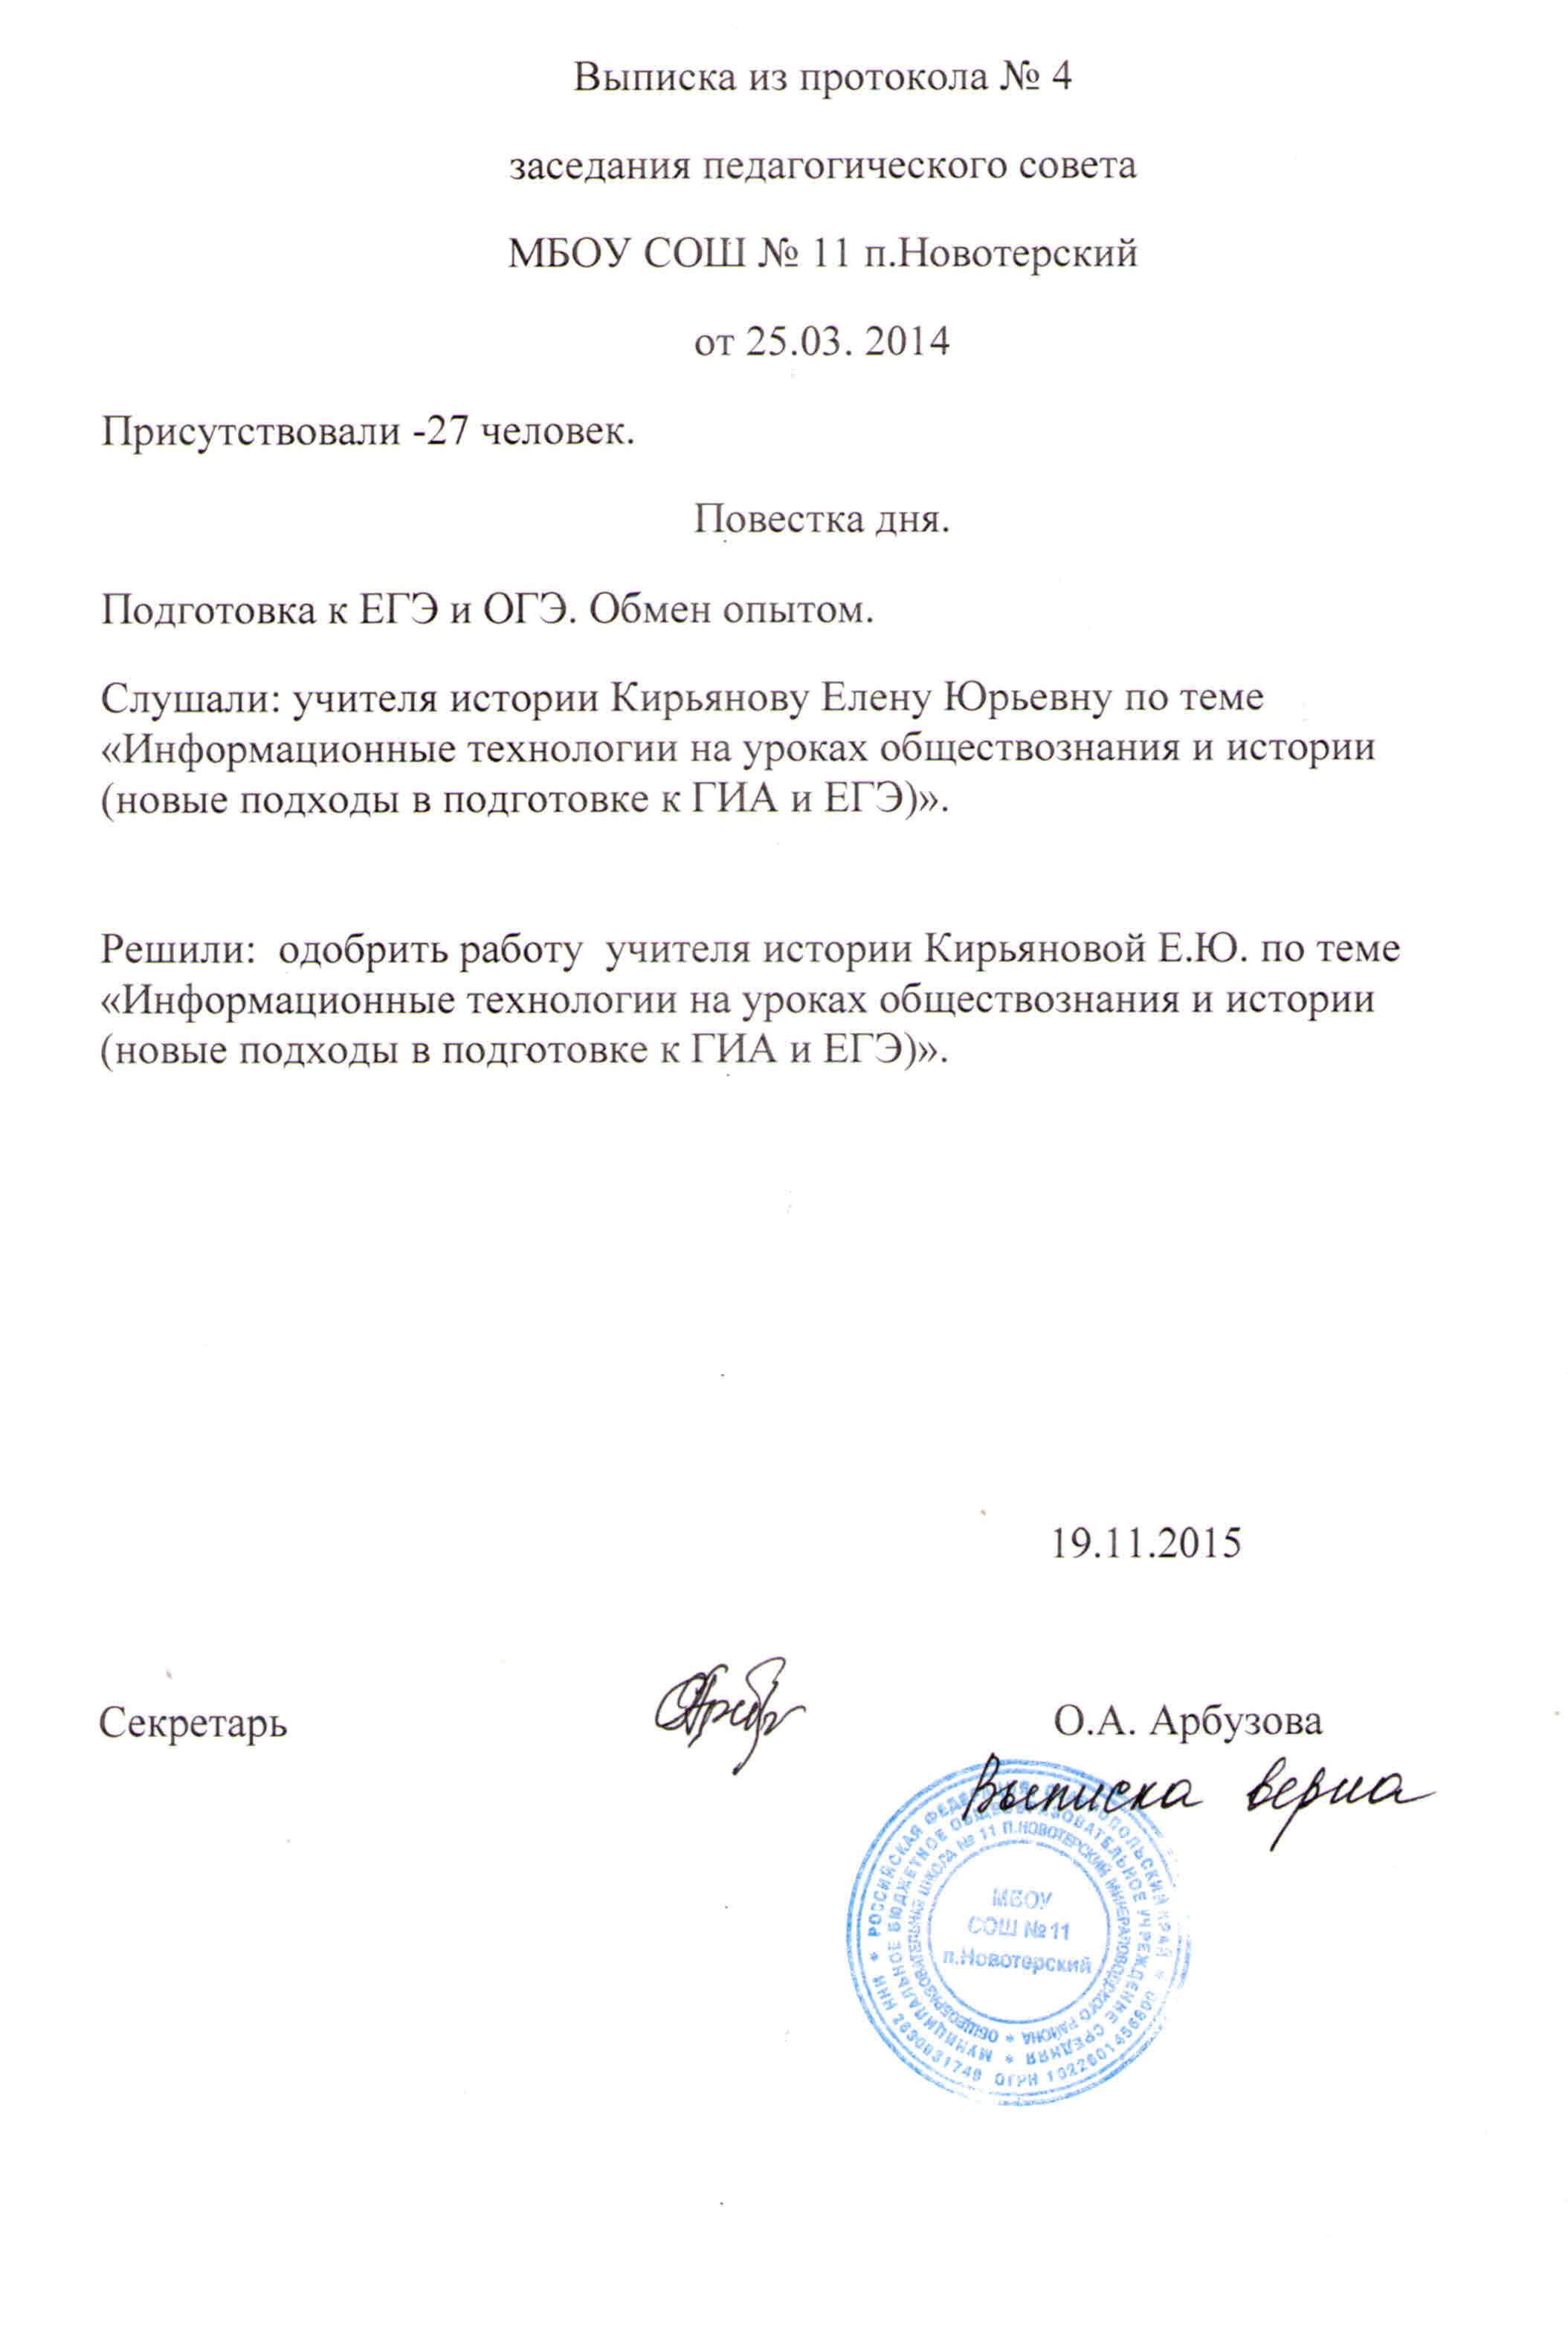 C:\Users\Сергей\Desktop\пс\Document_8.jpg